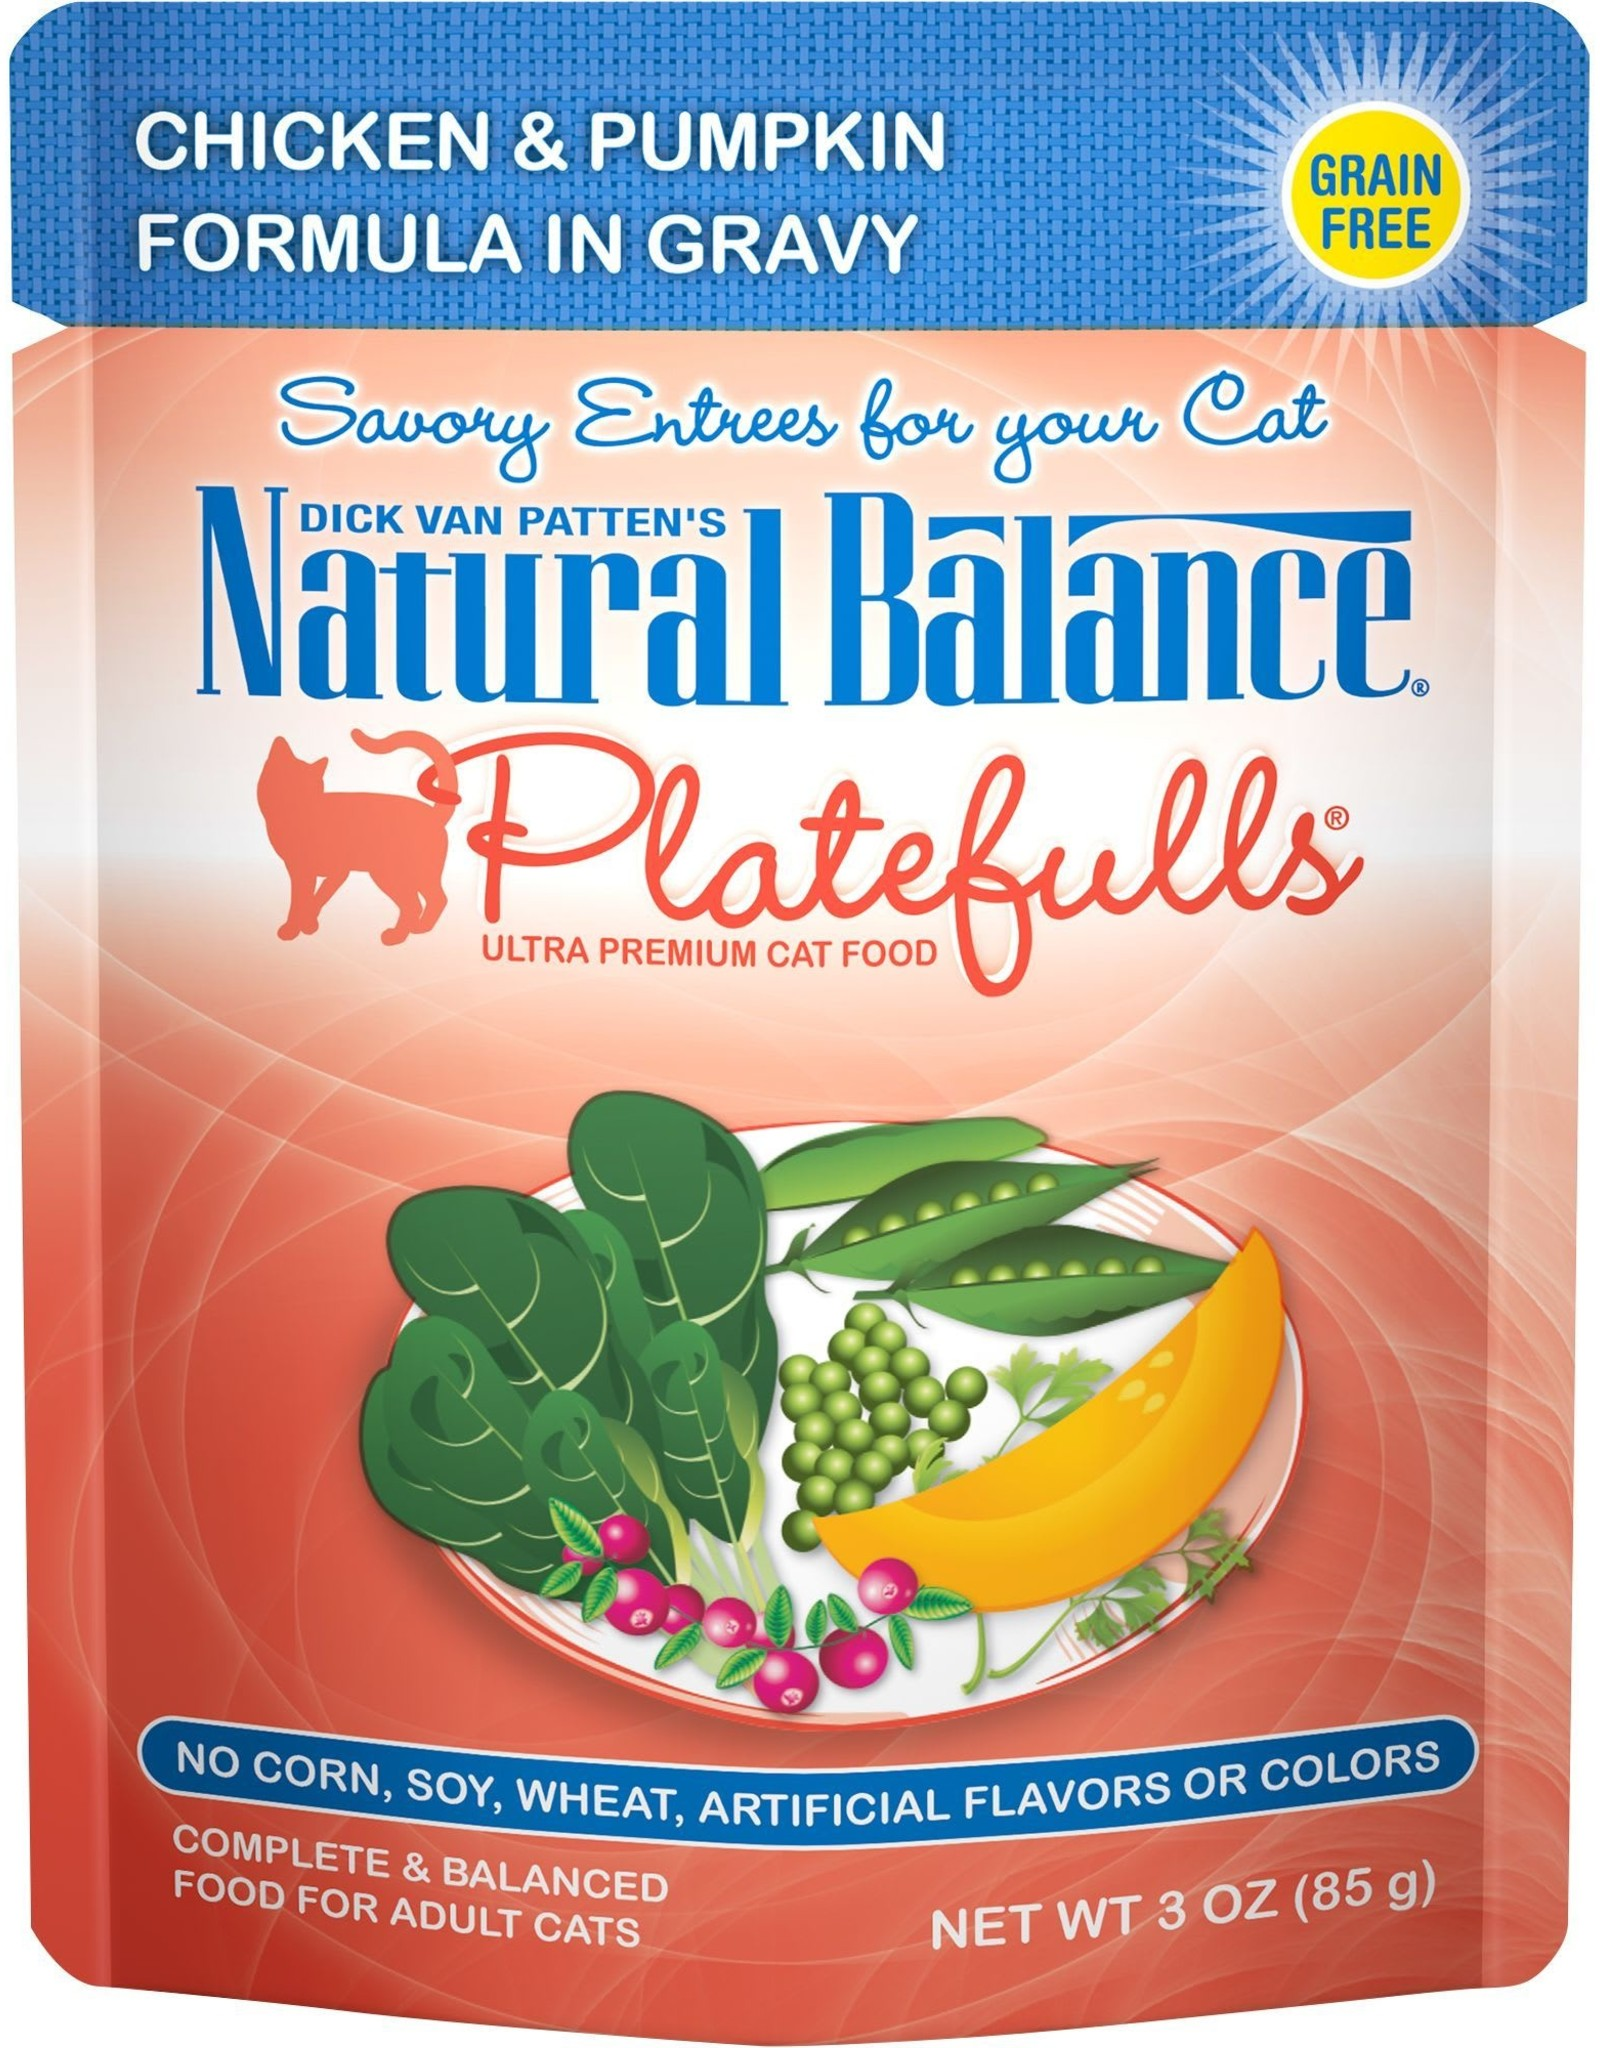 NATURAL BALANCE PET FOODS INC NB Platefulls / Indoor / Chicken & Pumpkin 3oz